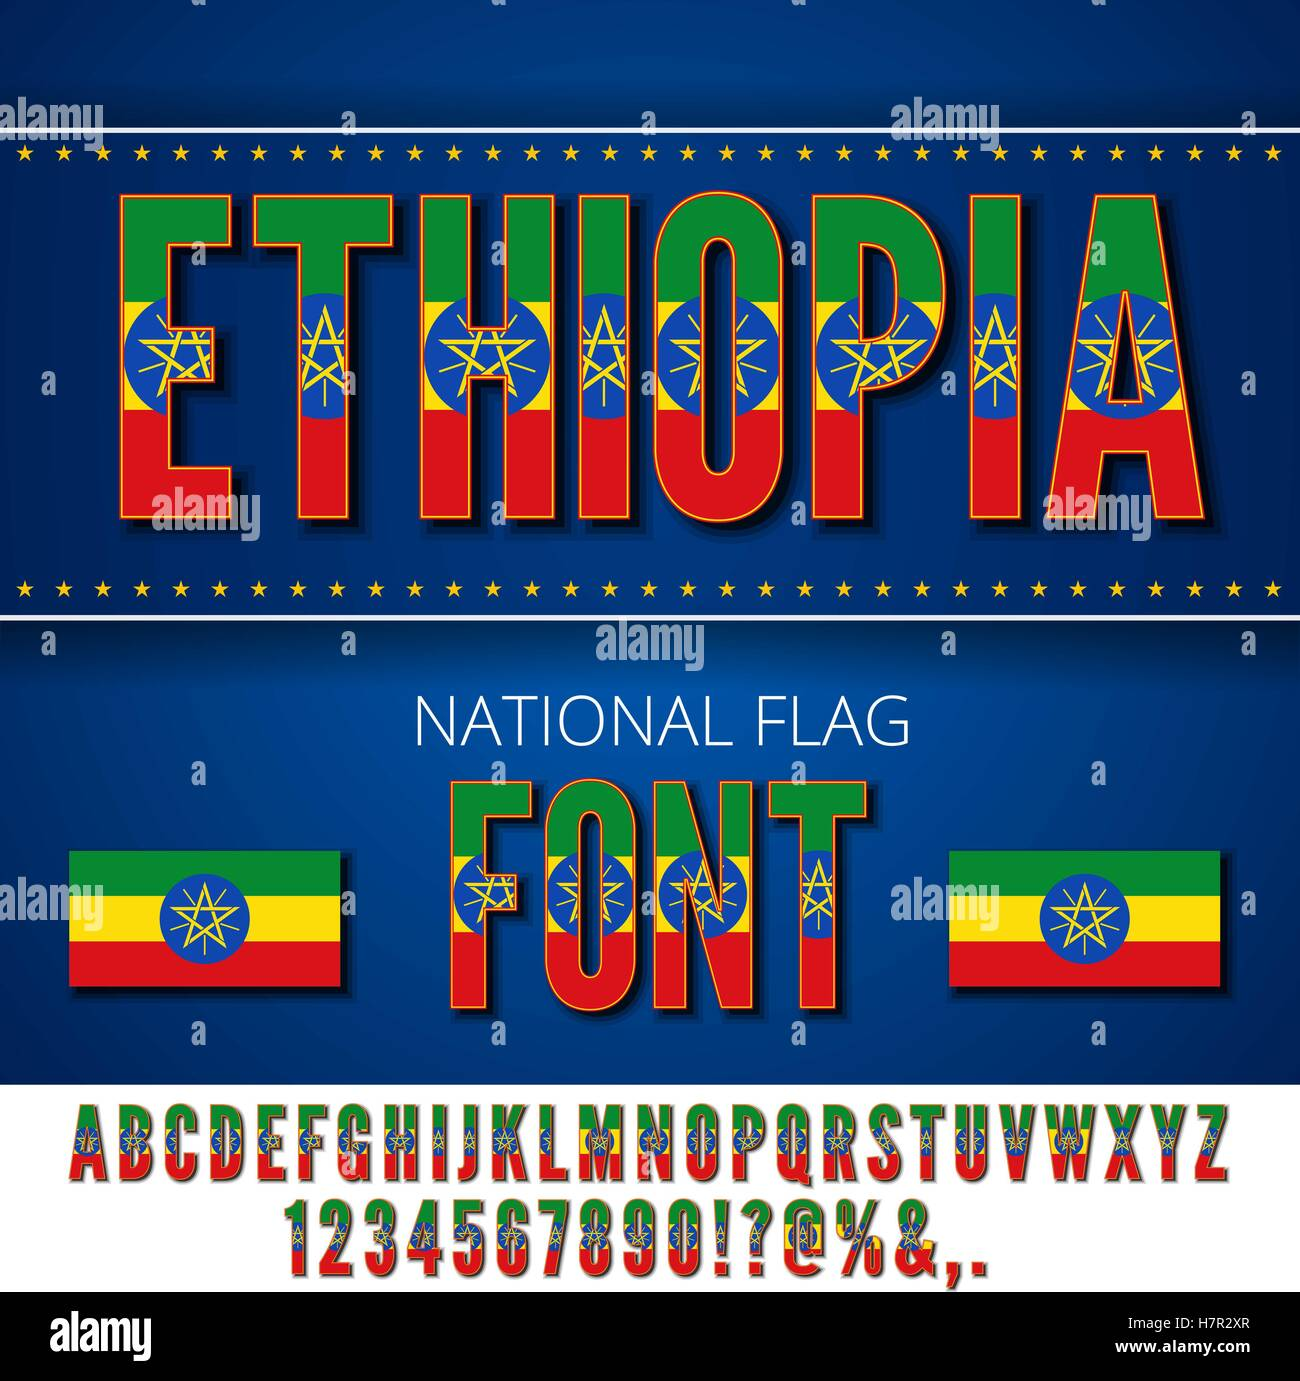 National Flag Font - Stock Vector